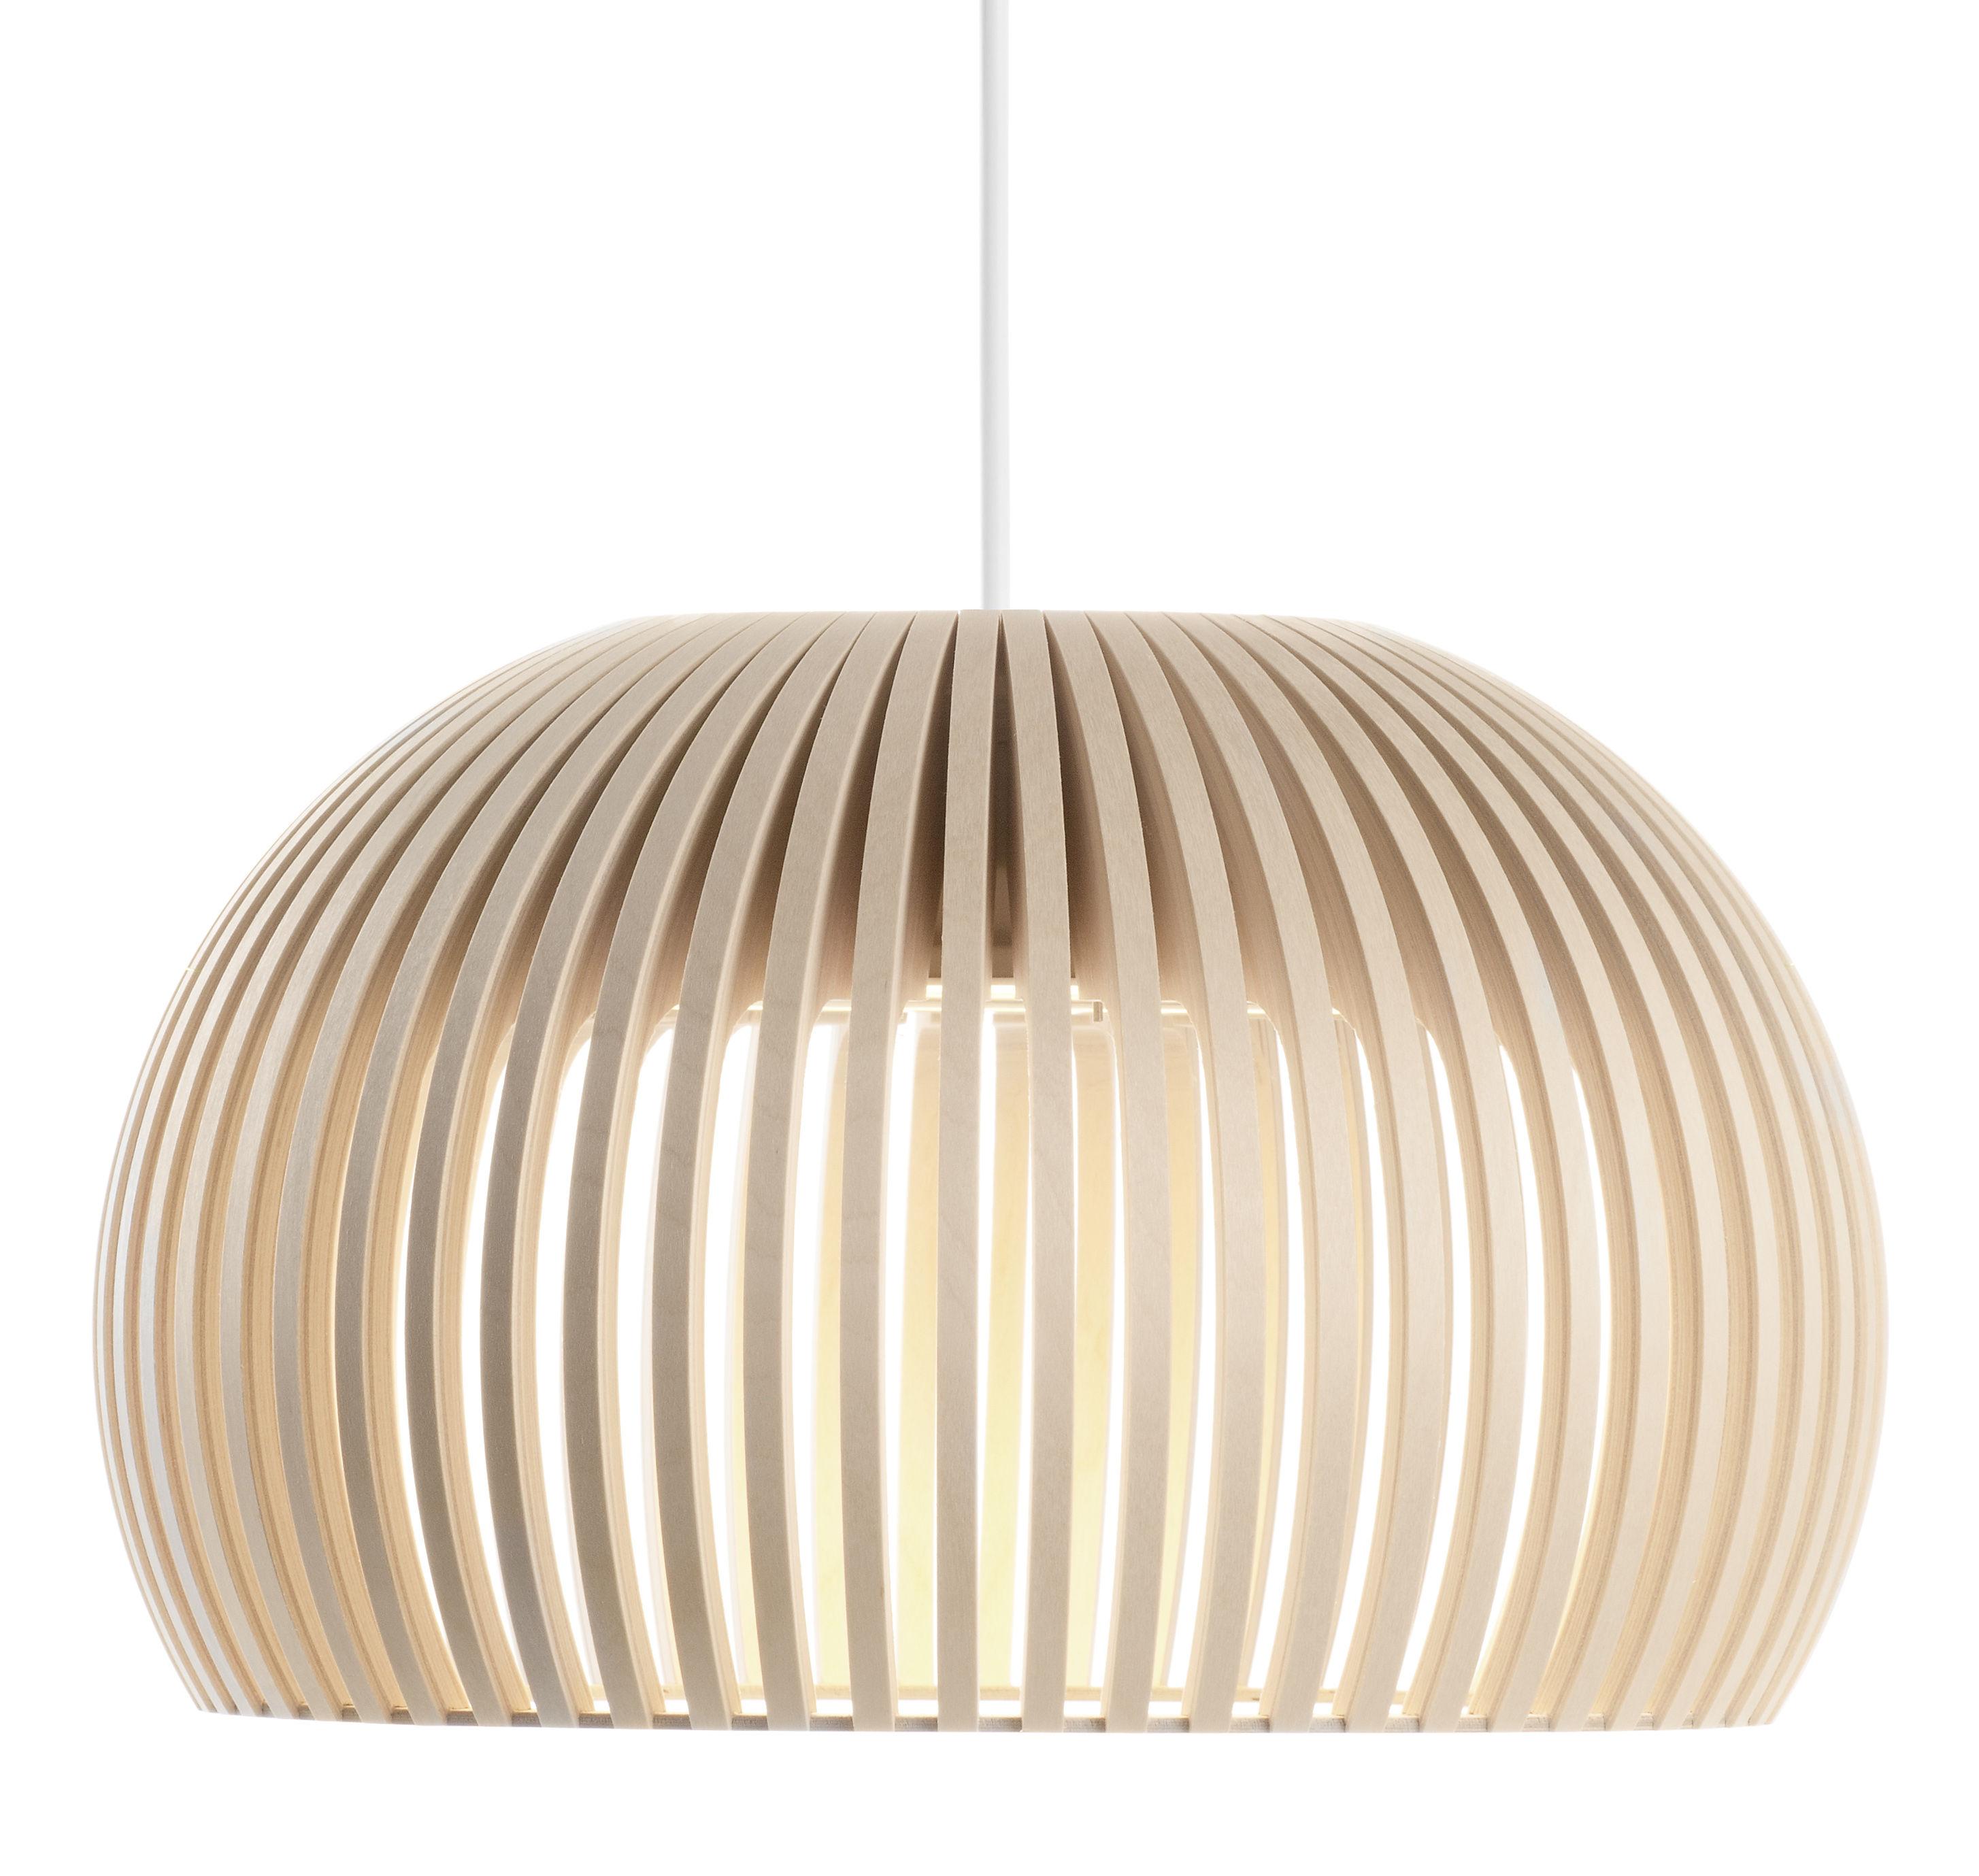 suspension atto led 34 cm bouleau naturel c ble blanc secto design. Black Bedroom Furniture Sets. Home Design Ideas